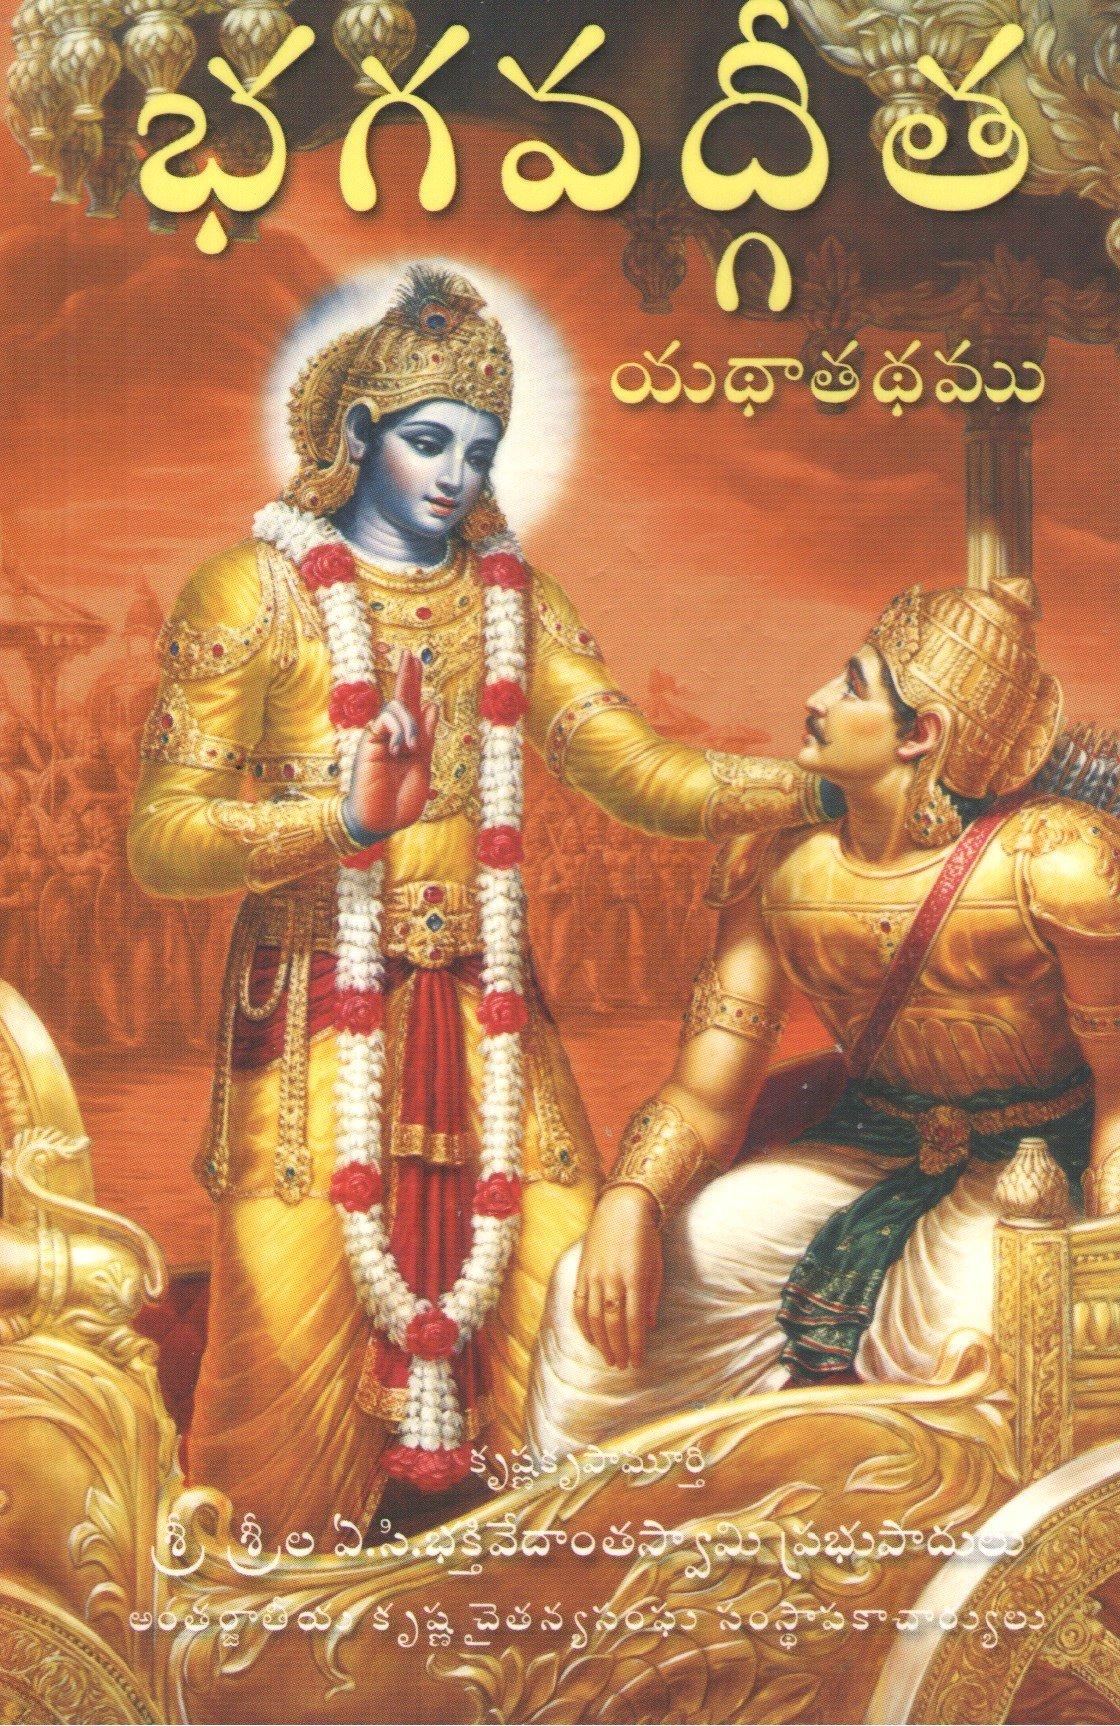 Buy Bhagavad Gita Telugu Pocket Size Book Online At Low Prices In